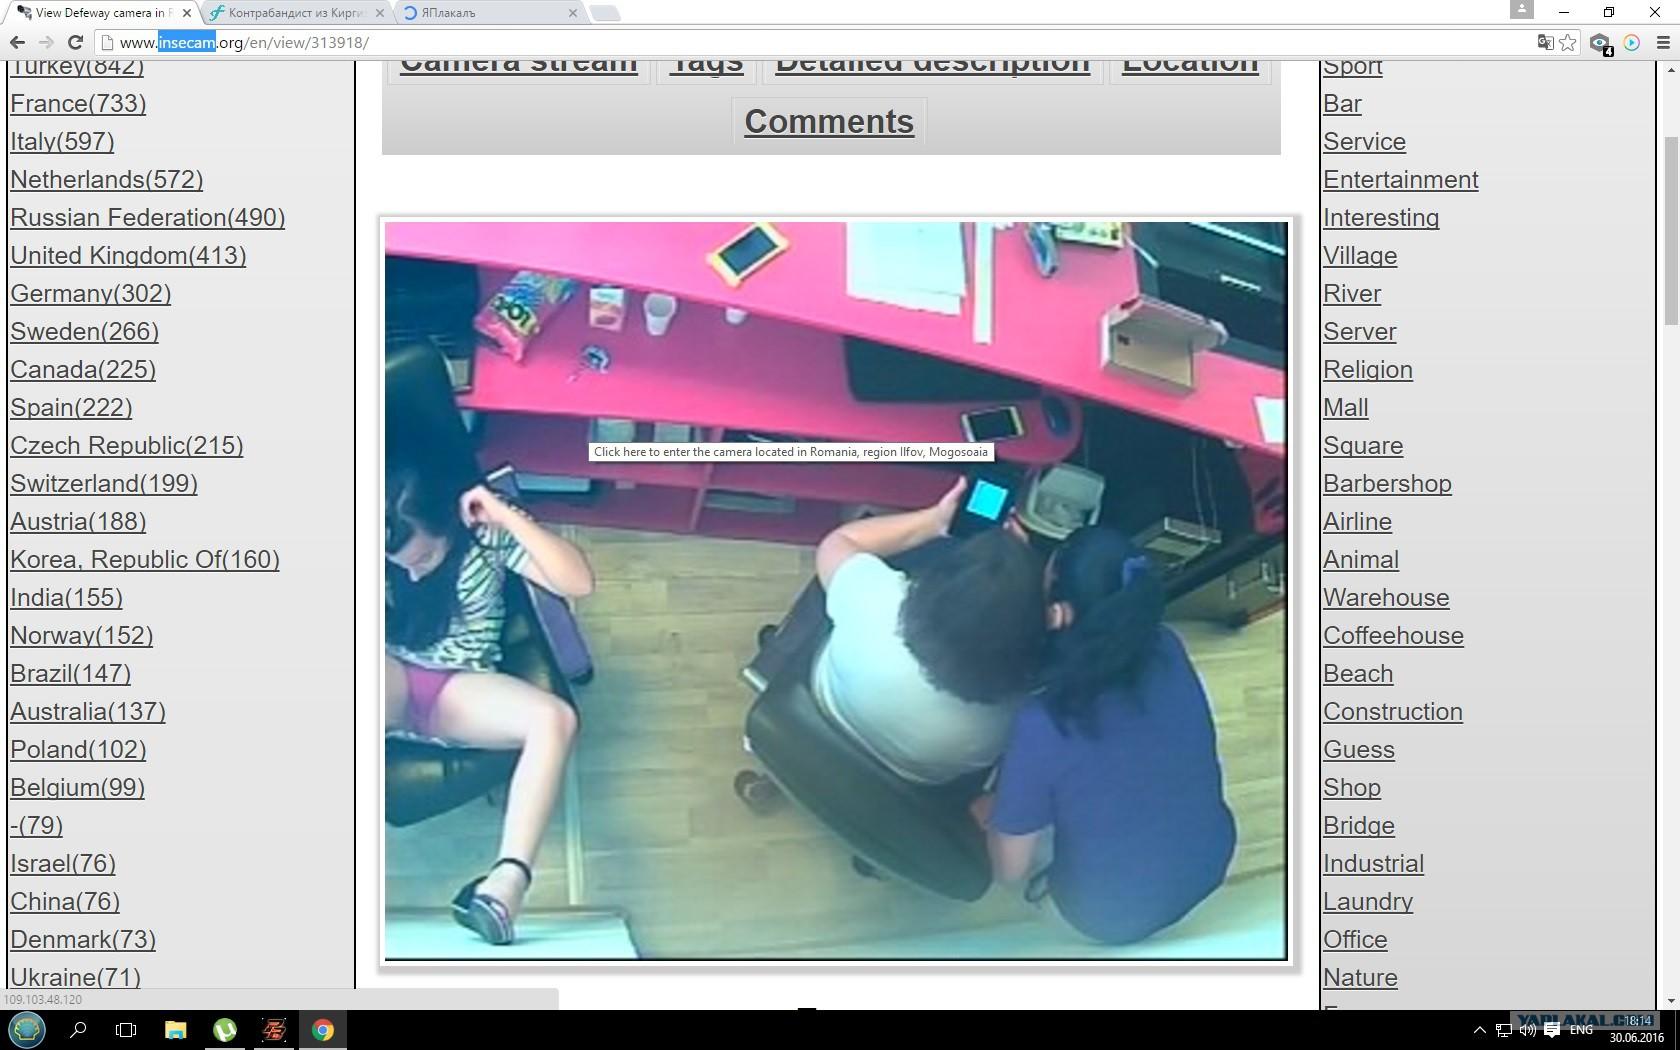 эро со взломанных веб камер